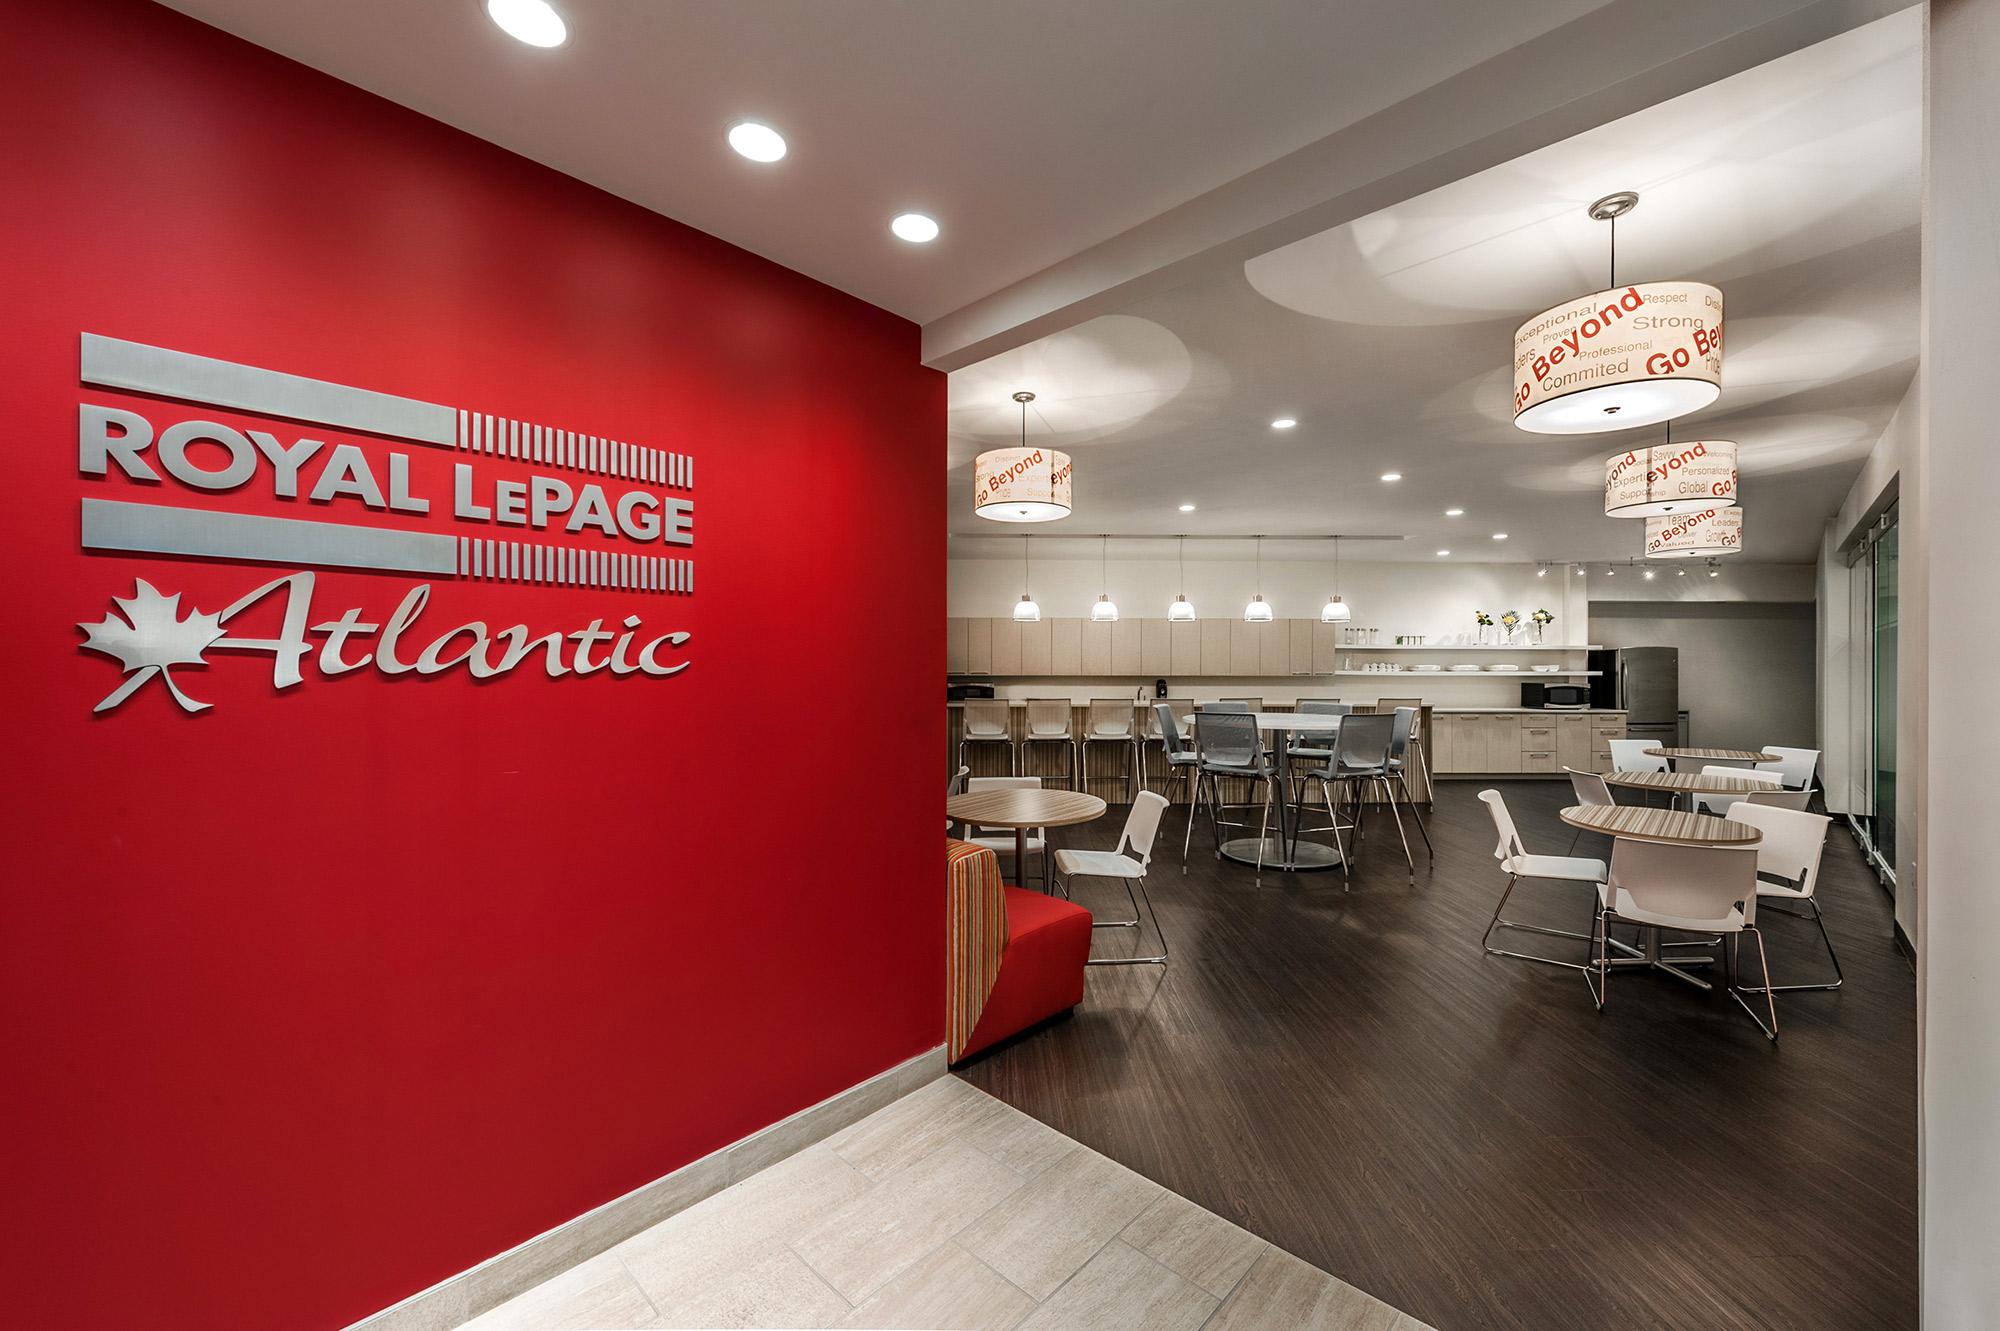 interior-design-real-estate-office-kitchen-sign.jpg